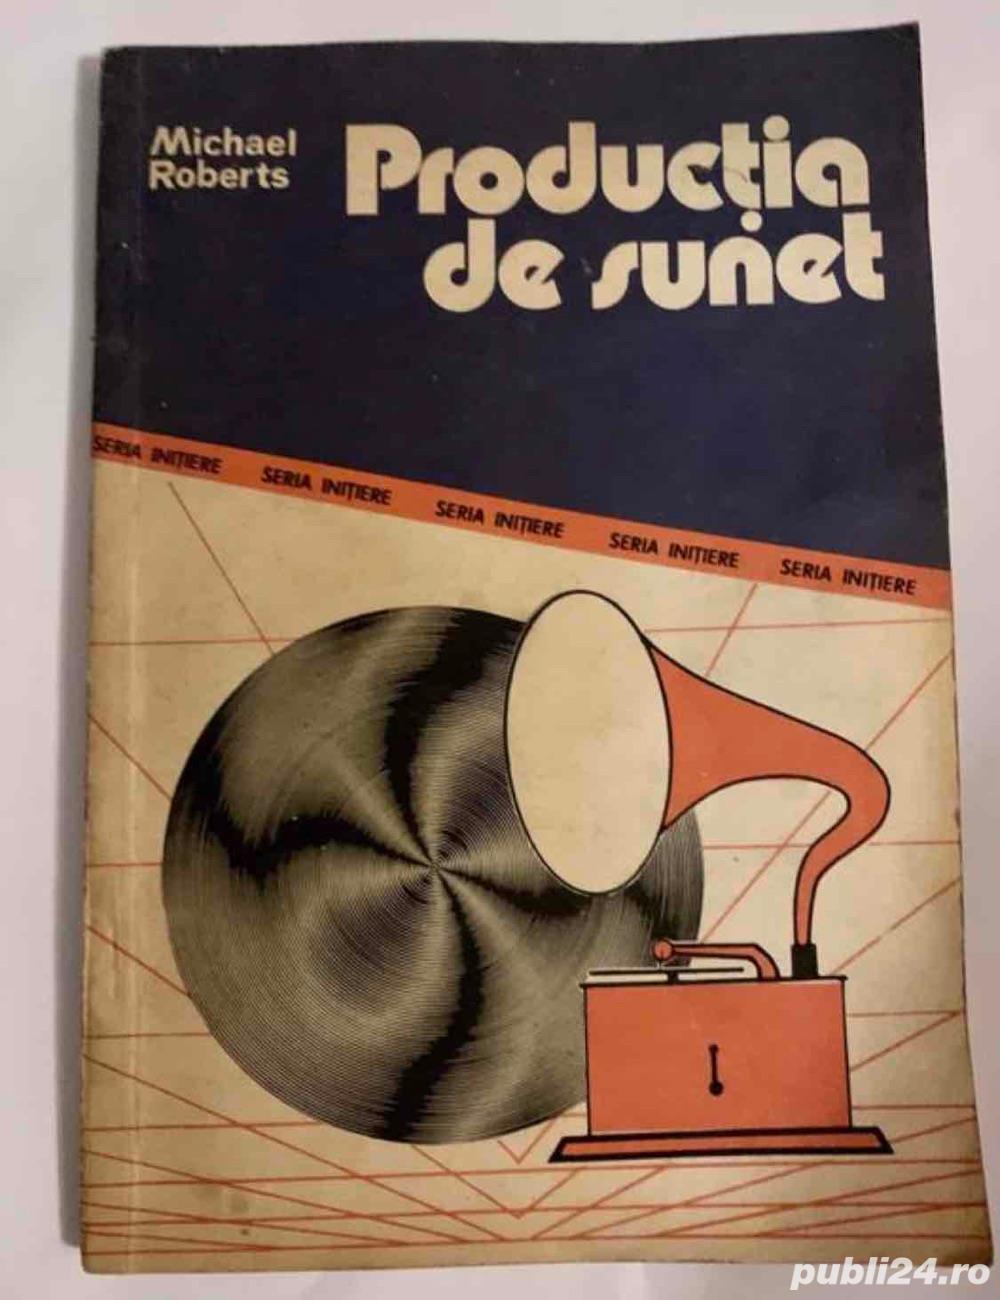 Productia de sunet, autor Michael Roberts